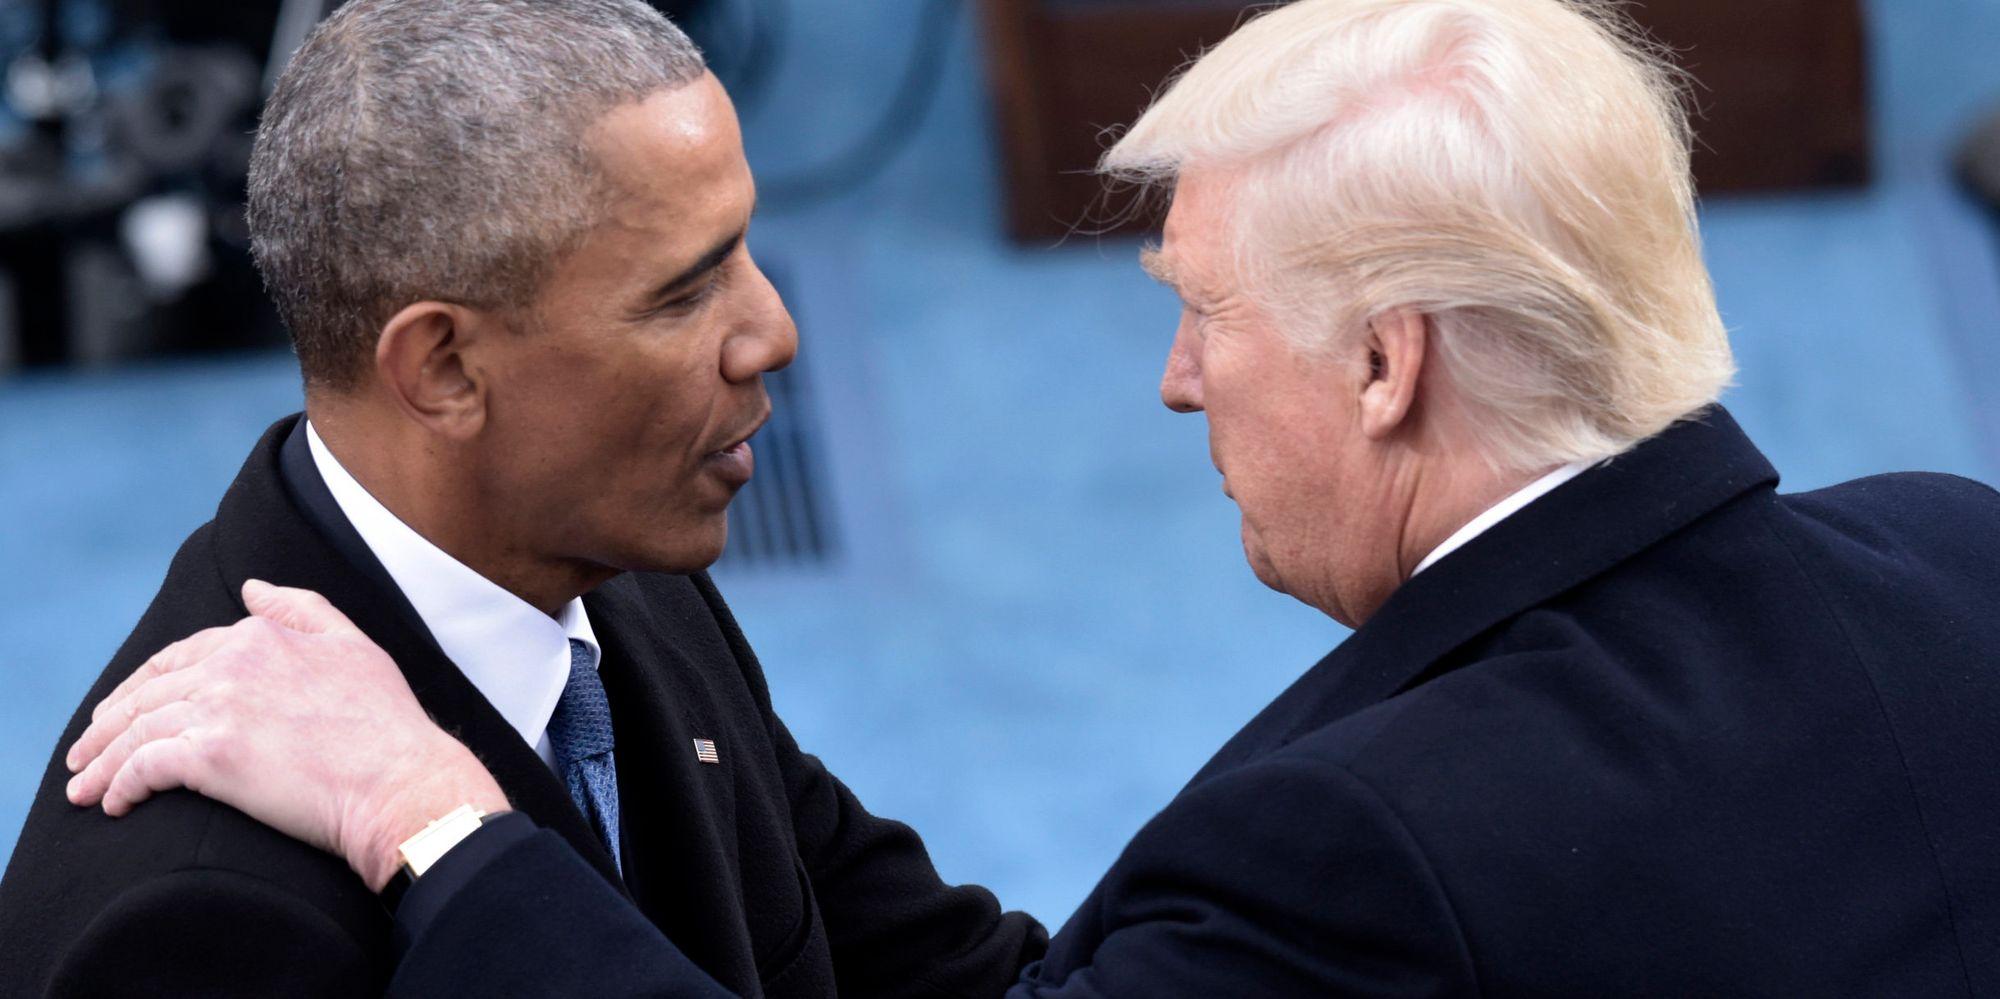 White House: Trump Still Won't Apologize To Obama Over Wiretapping